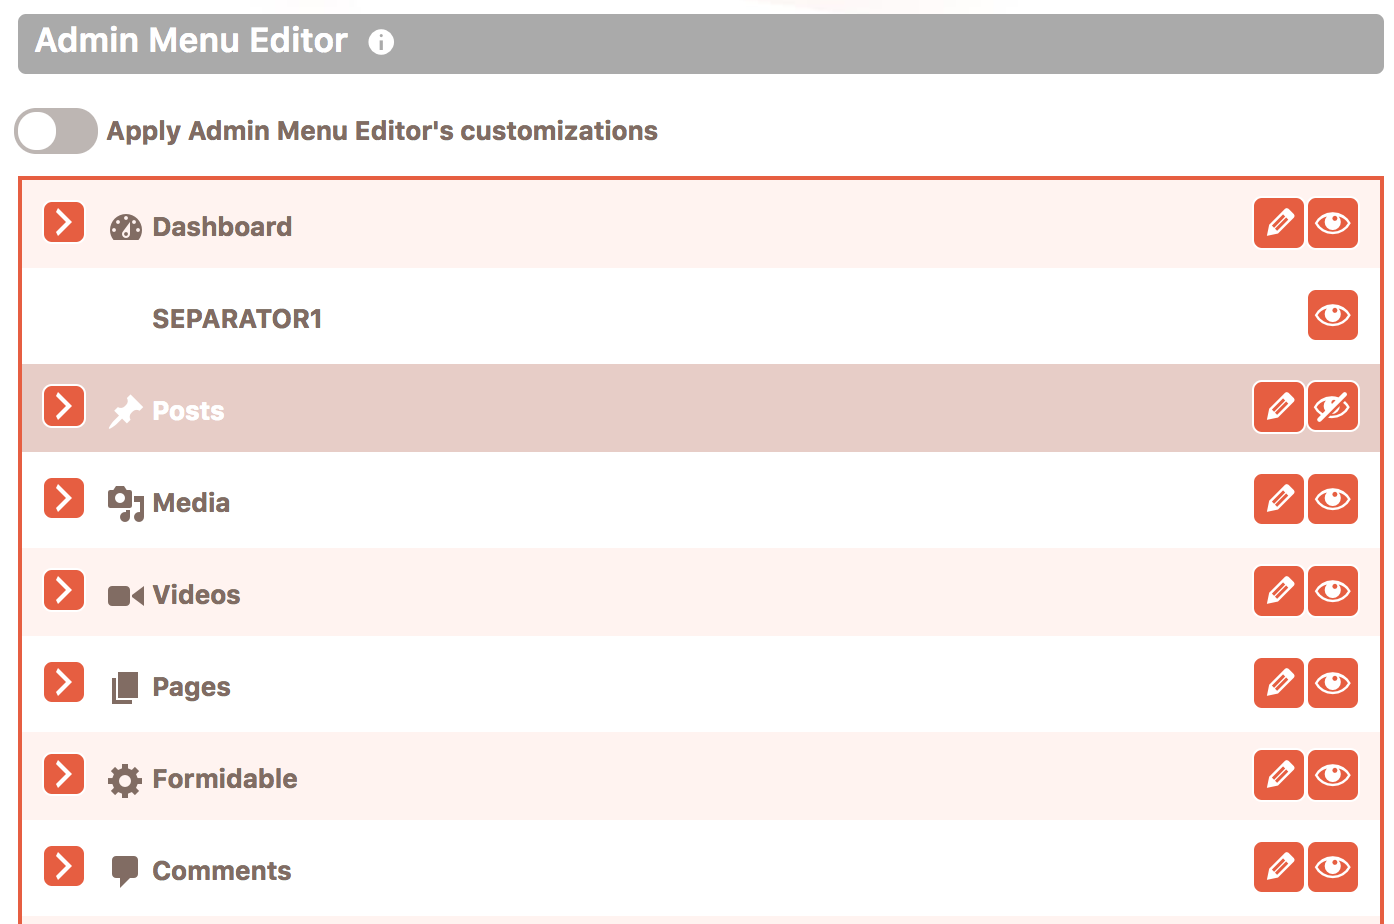 Admin menu editor with the list of menu items in Cusmin